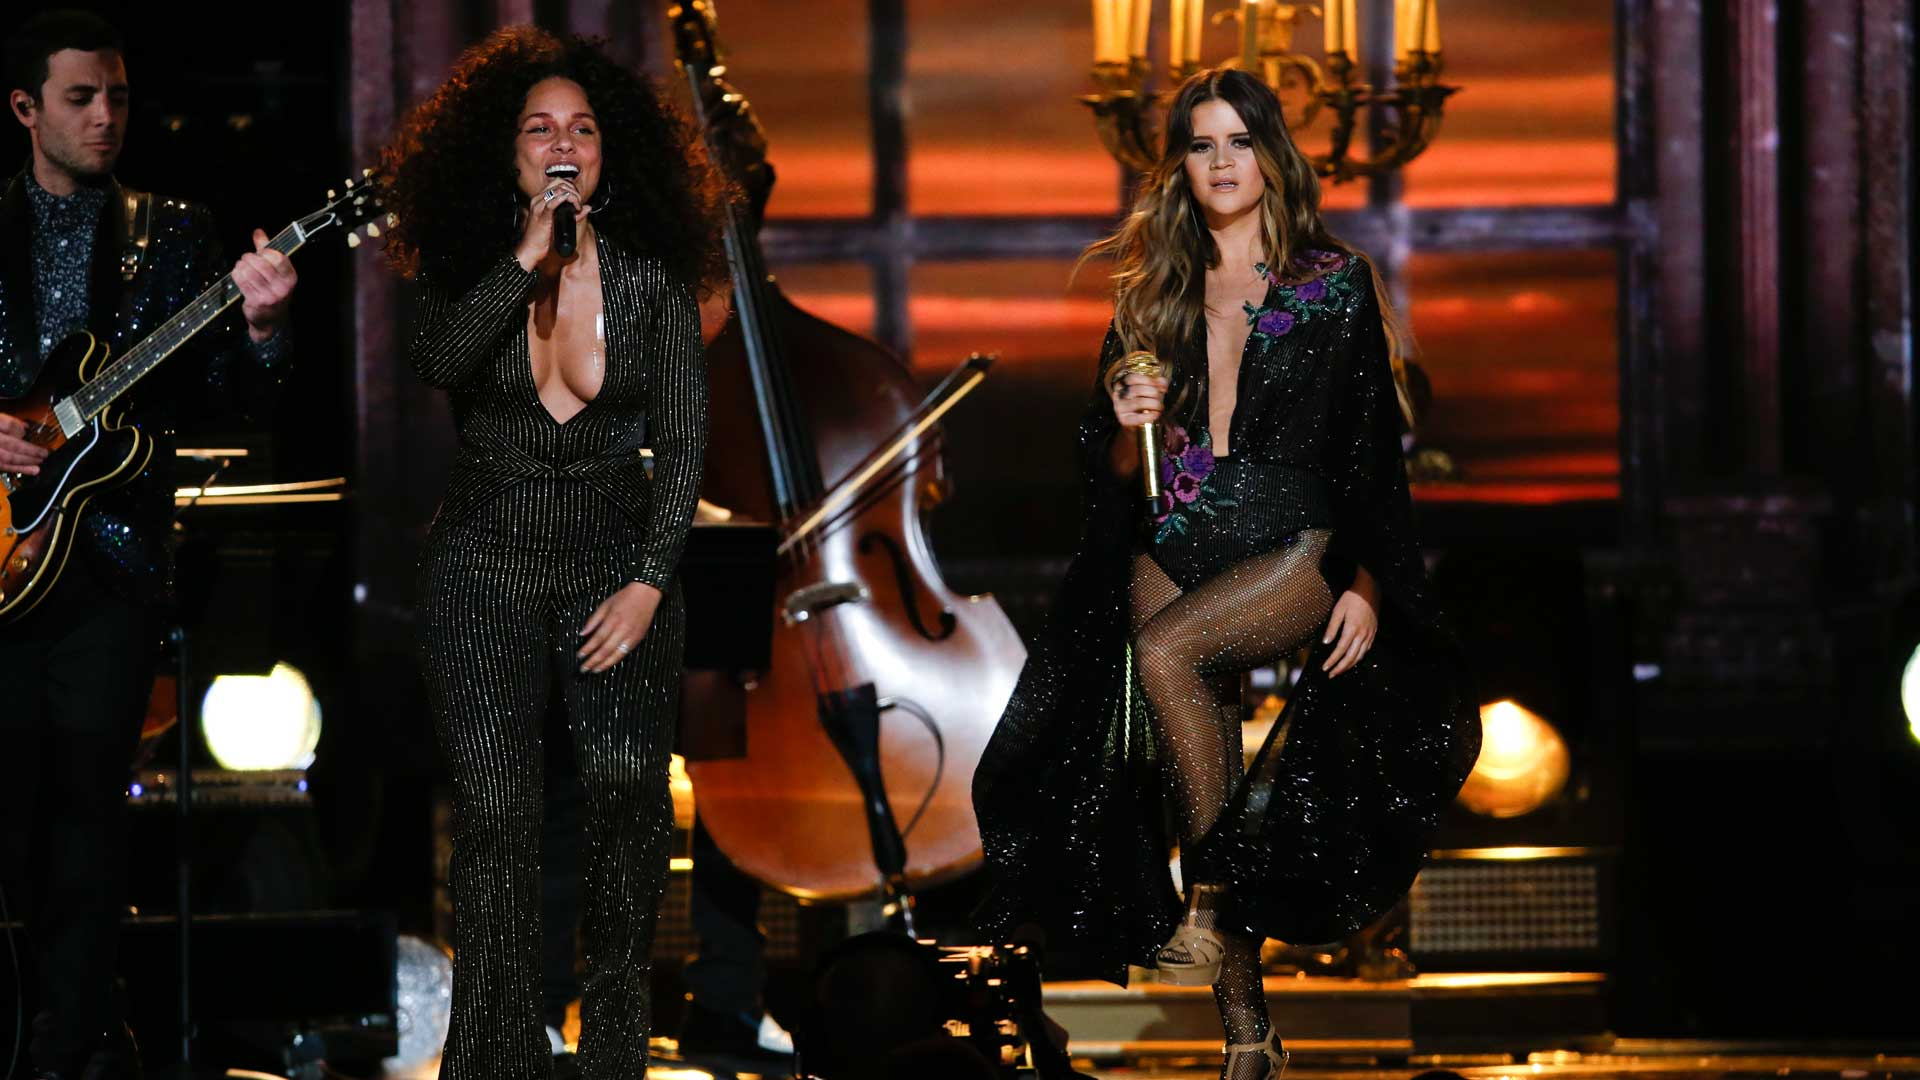 Maren Morris featuring Alicia Keys perform